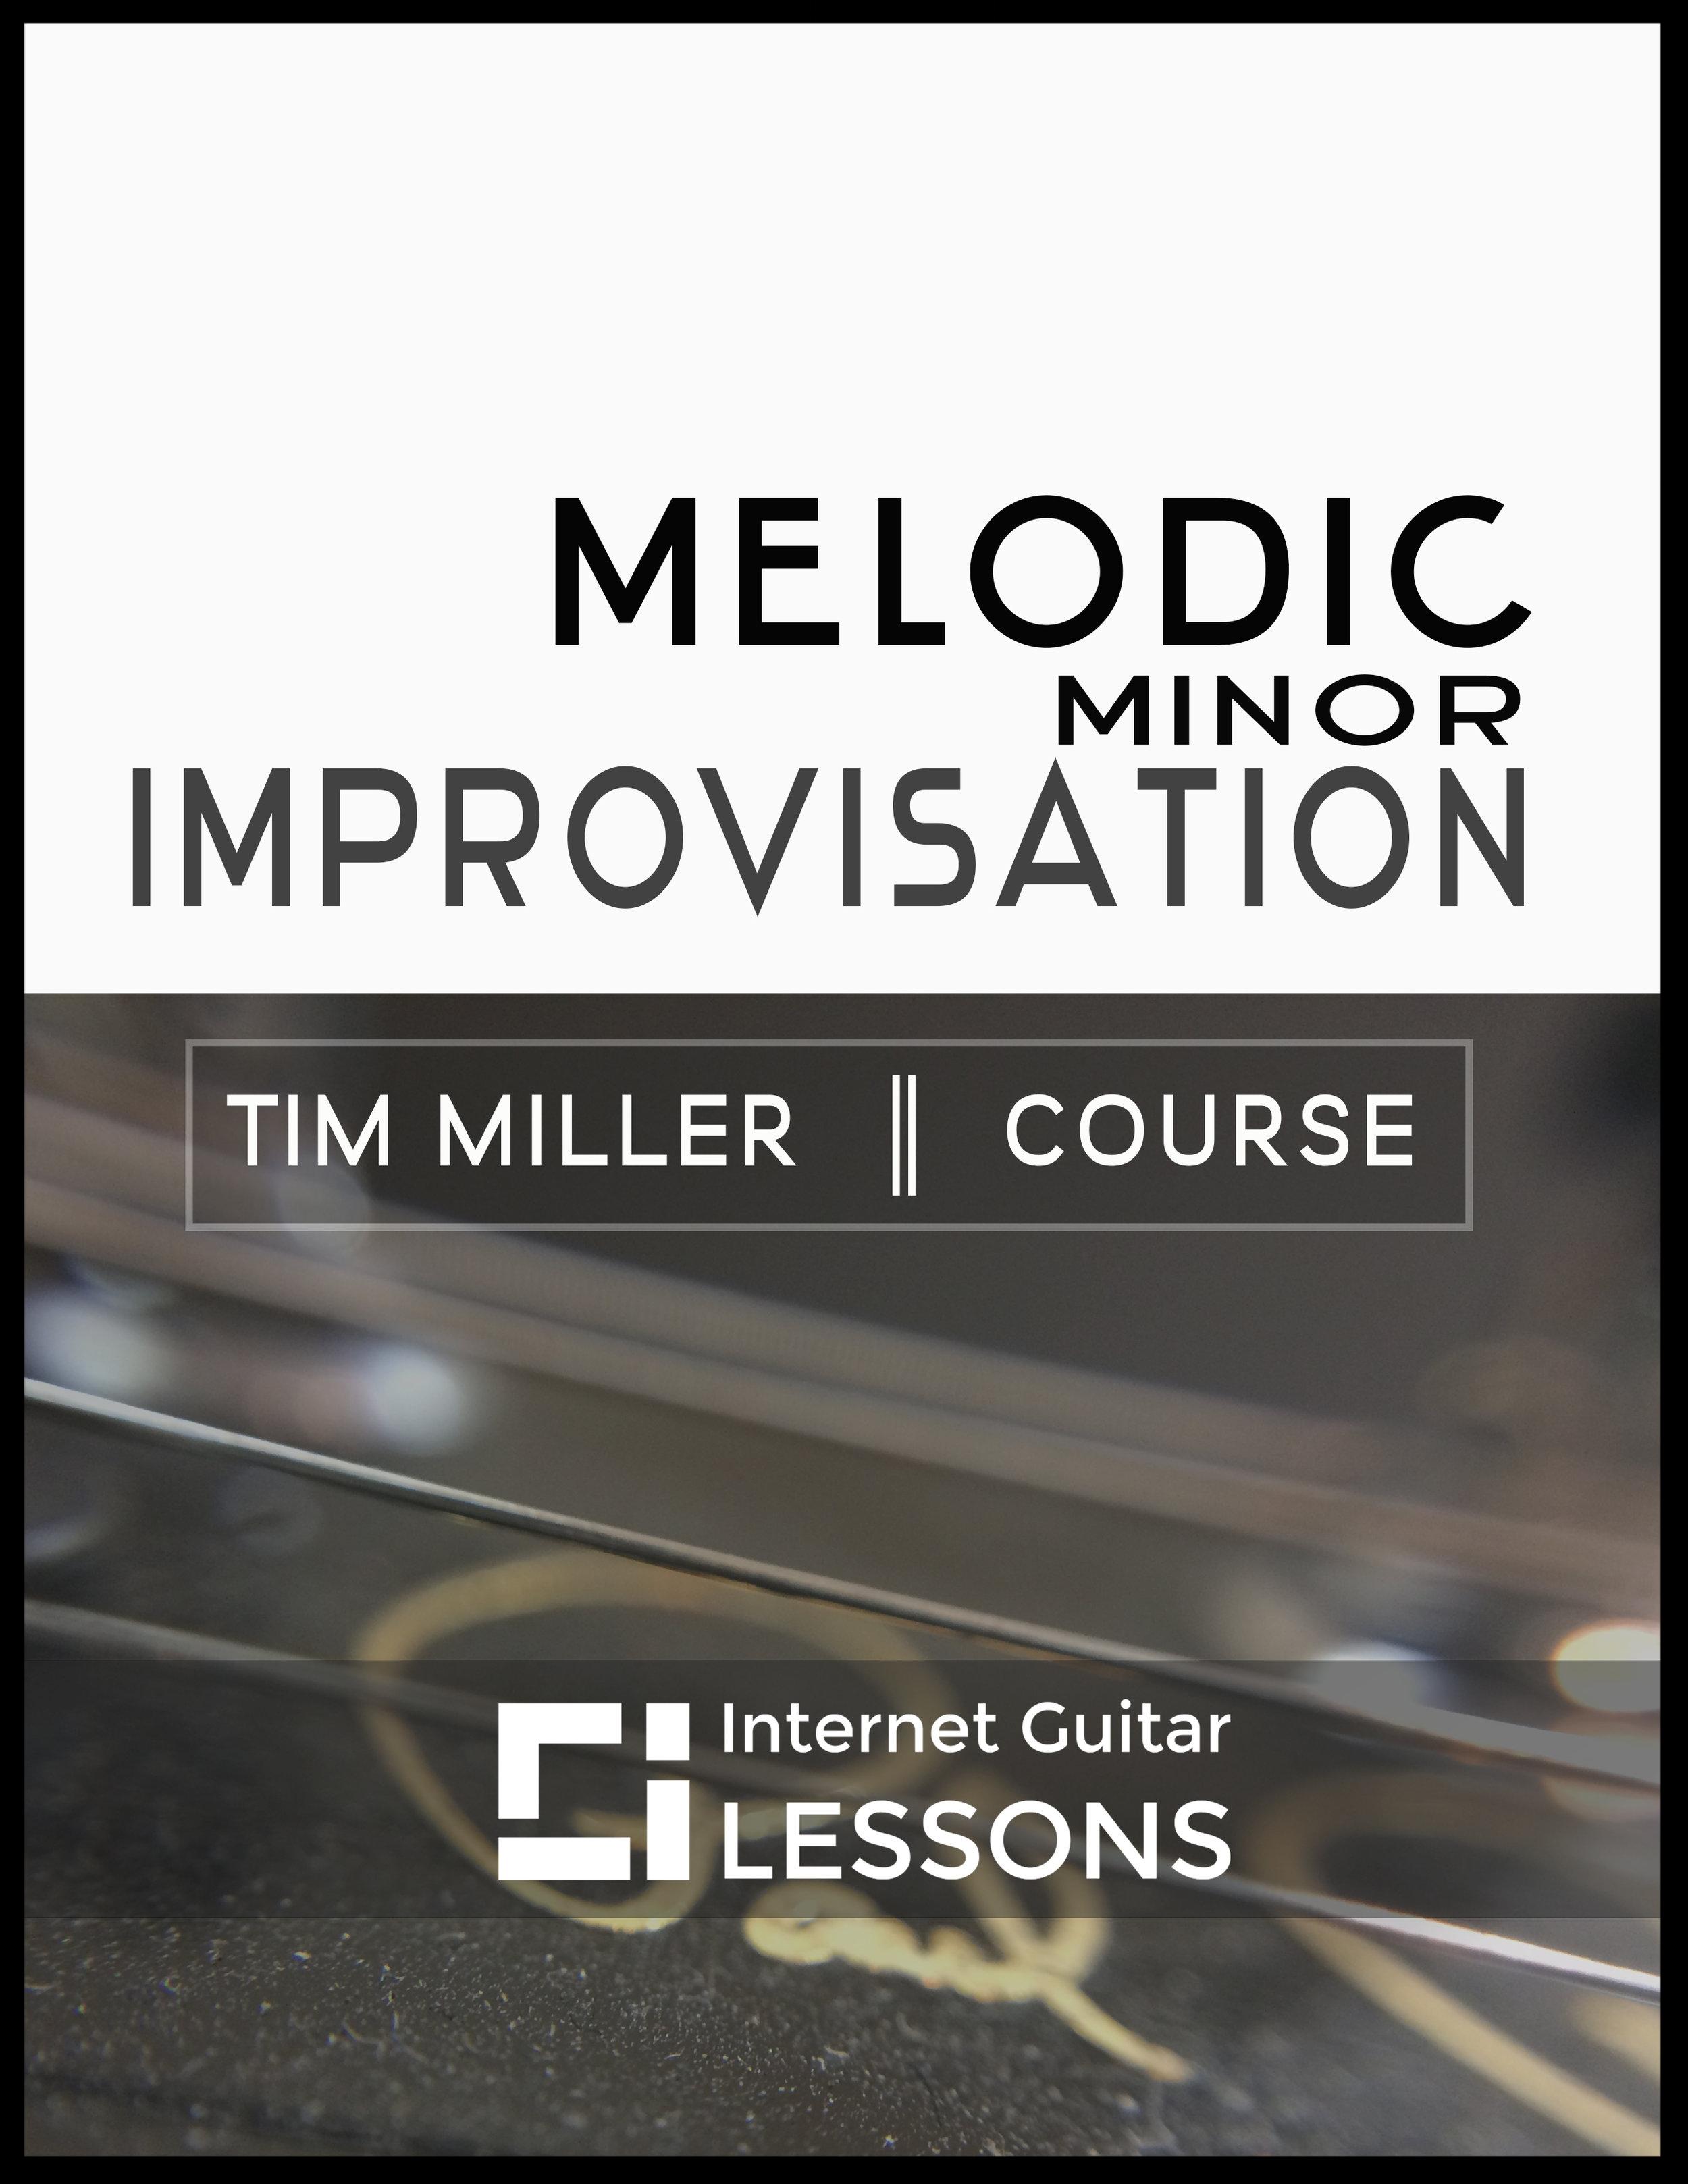 Melodic Minor Improvisation 1.17 flat.jpg